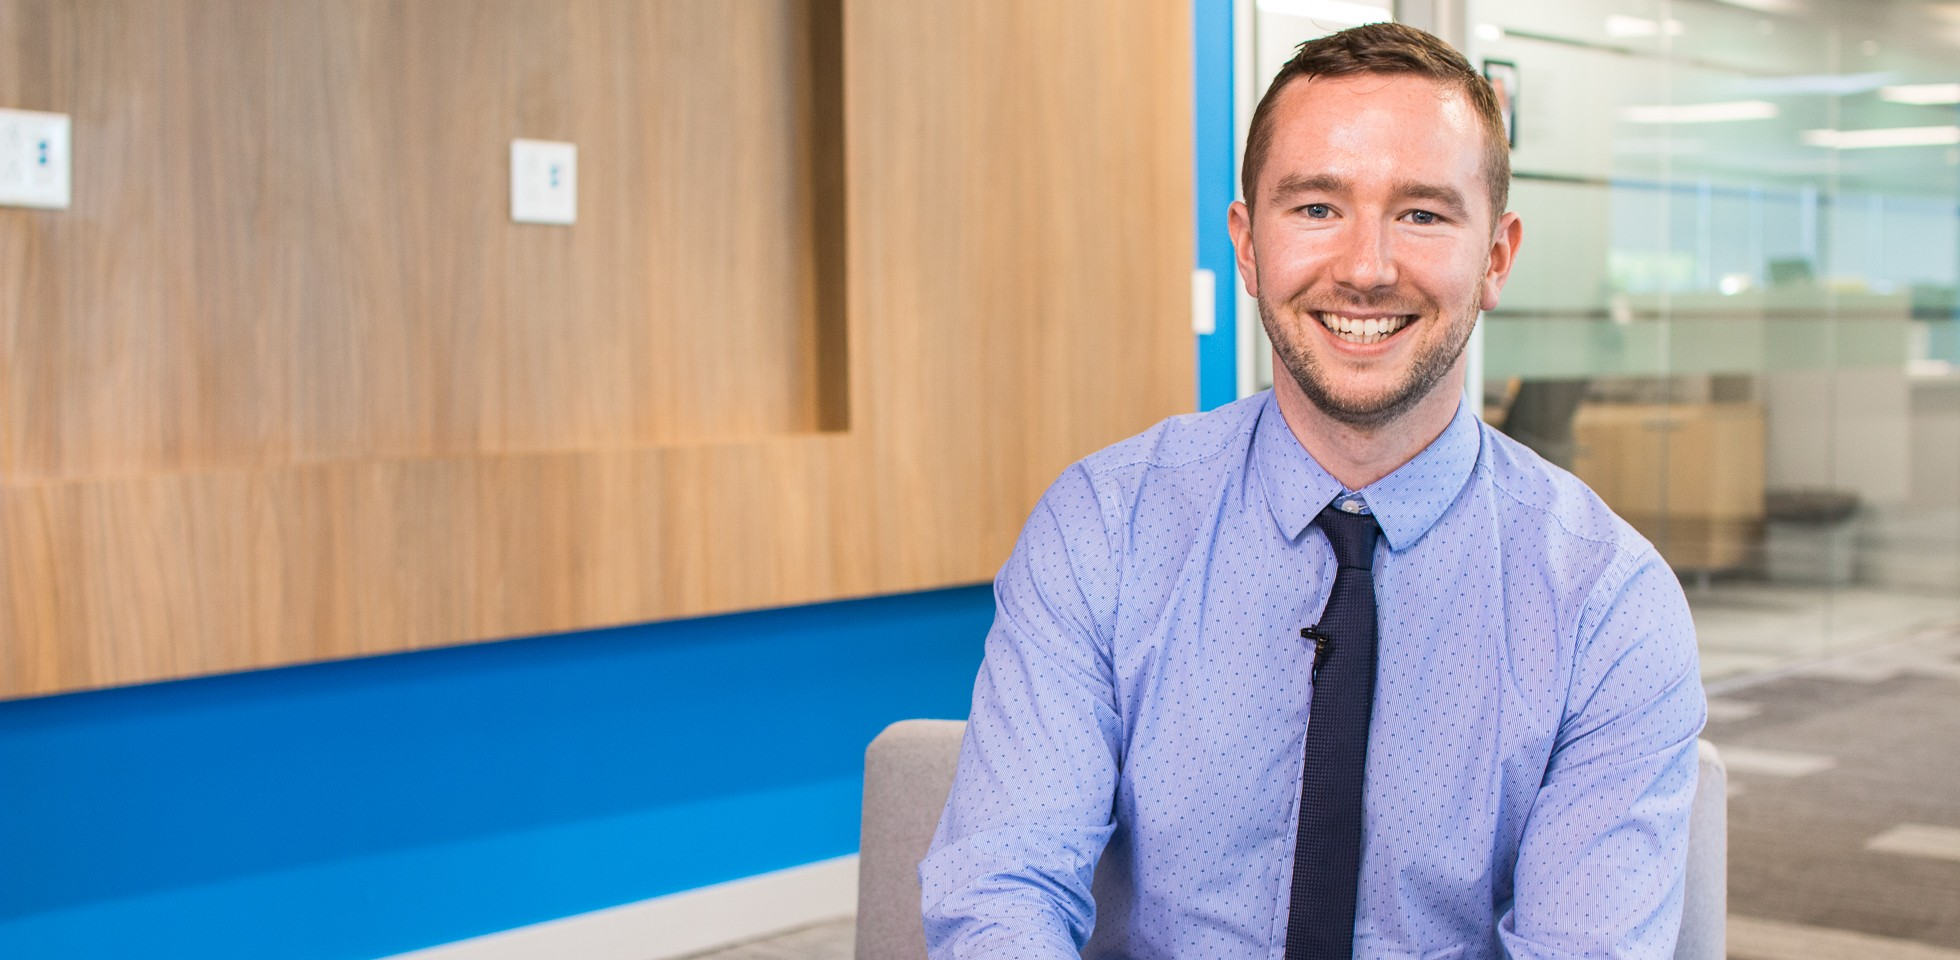 Robert Galvin, Senior Process Engineer - Baylis Medical Careers